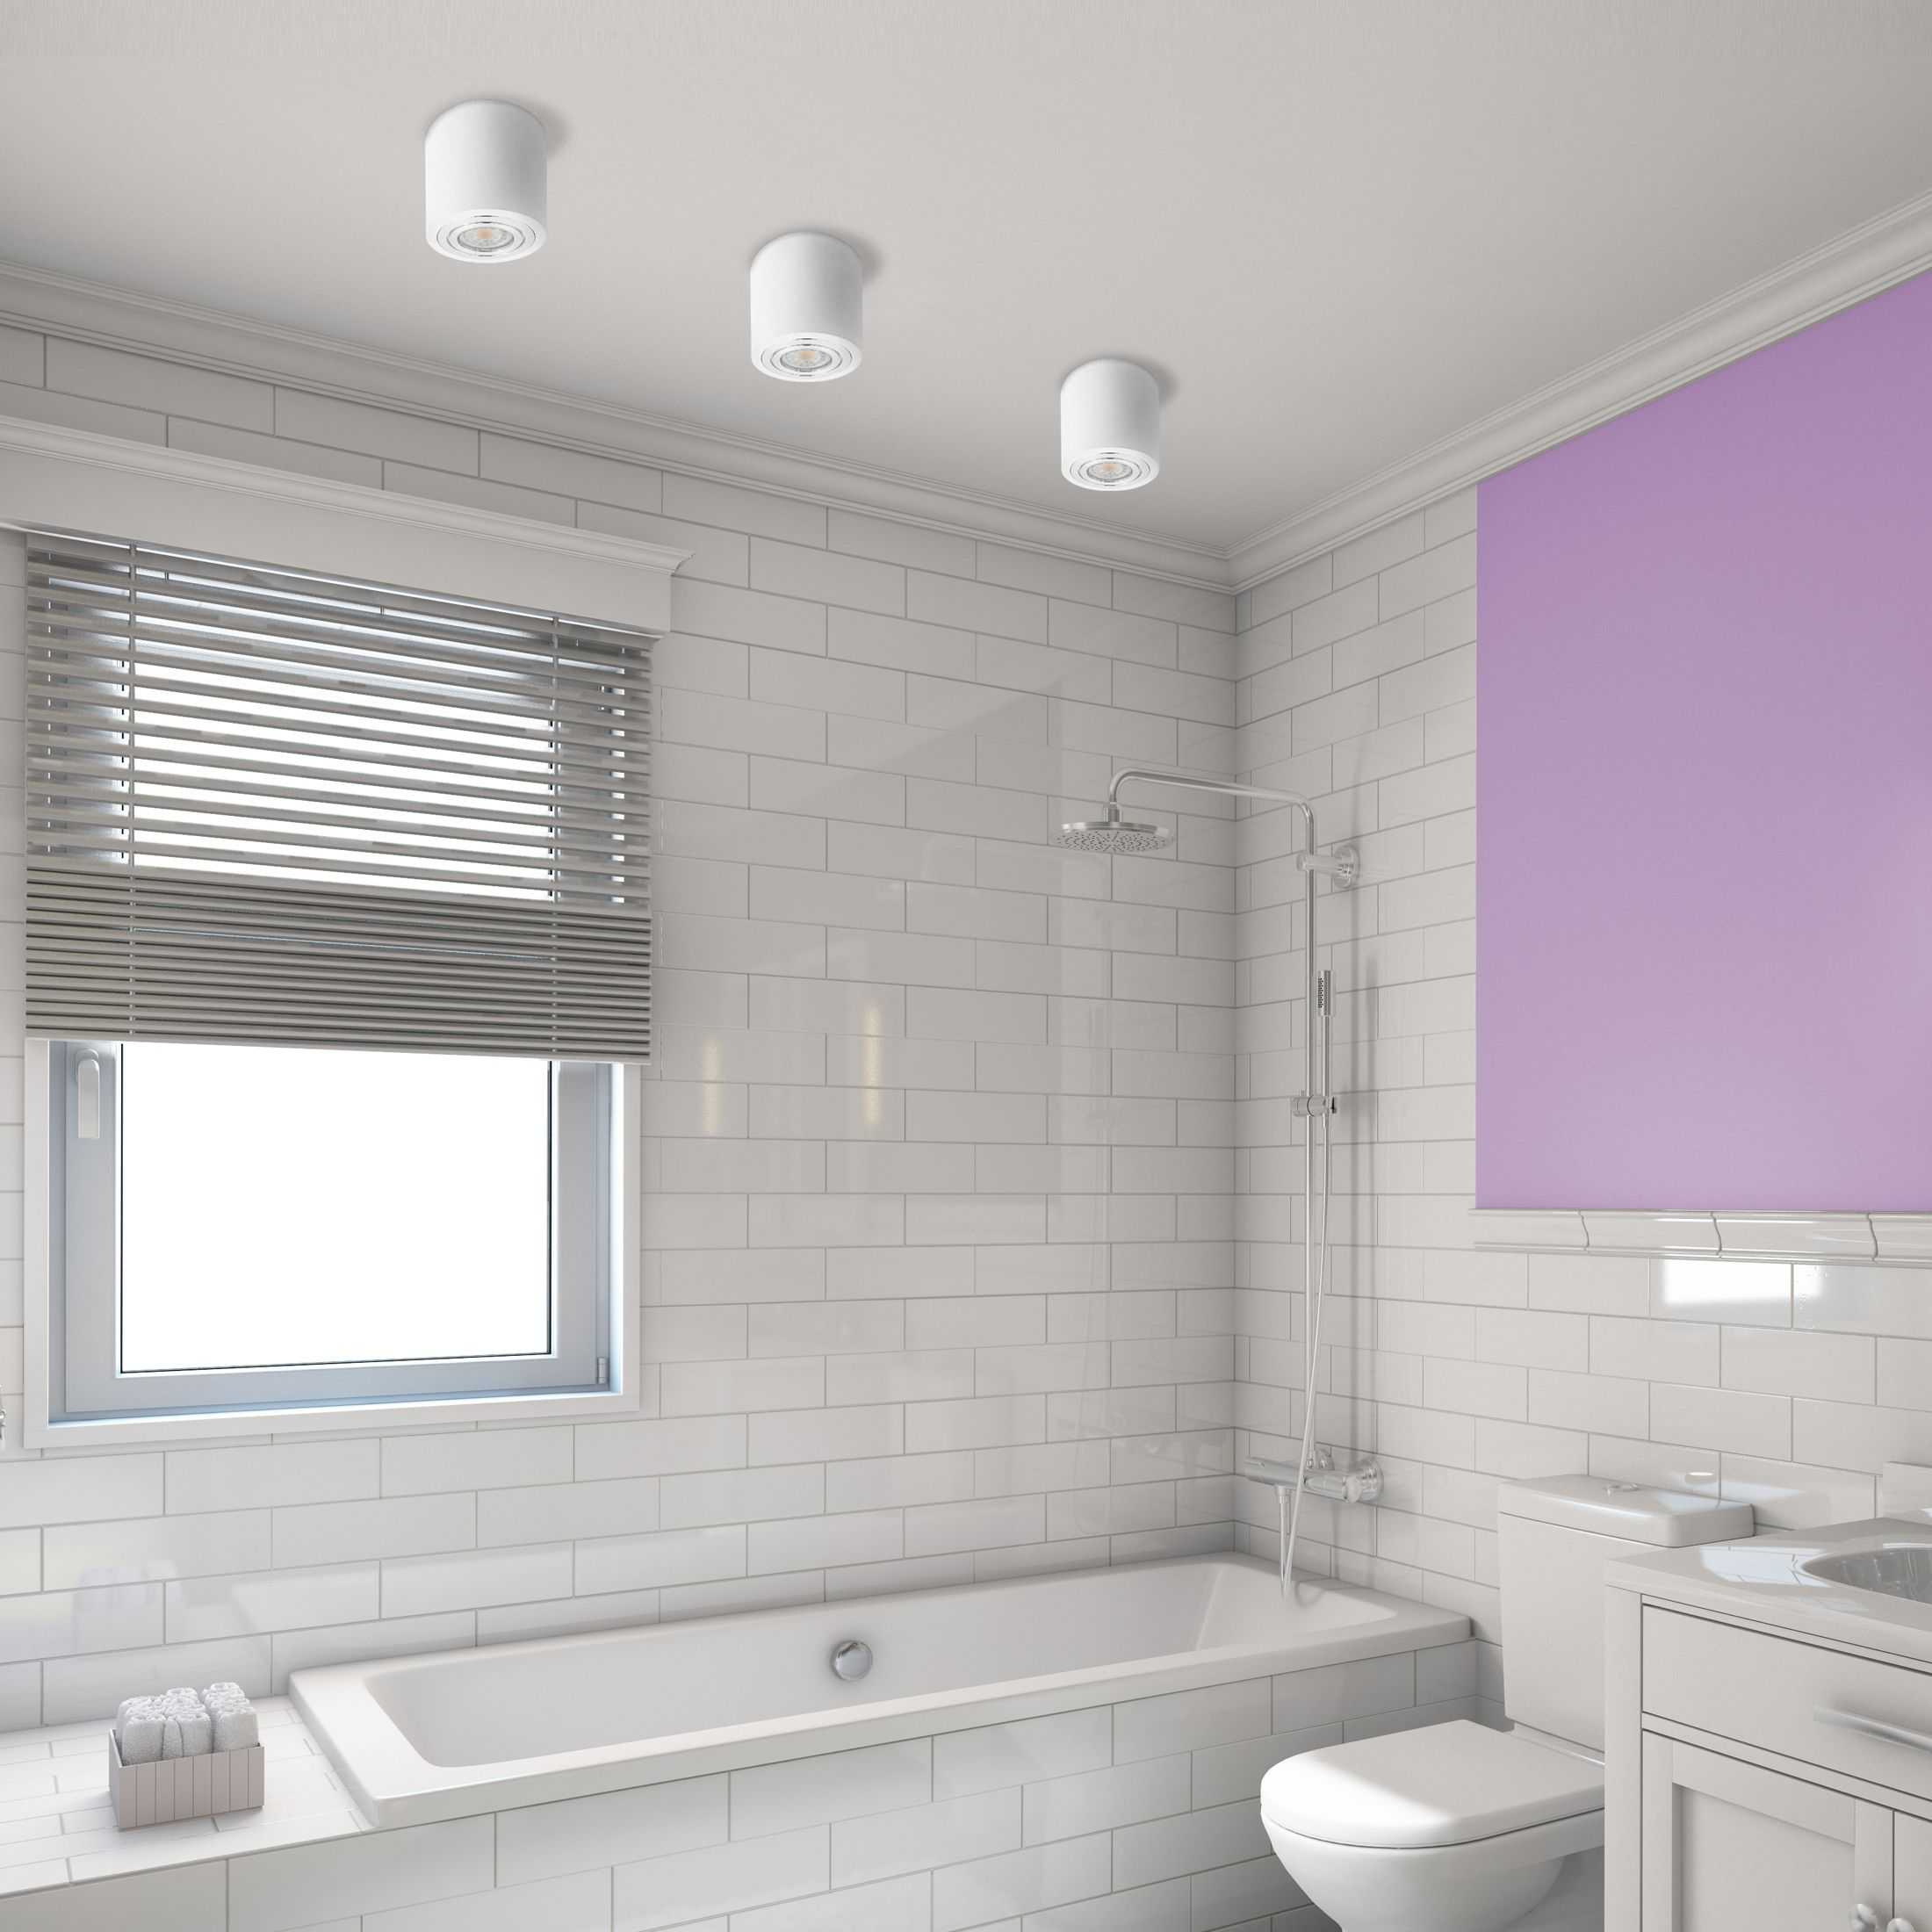 Led Deckenleuchte Bad Ip44 Inkl Led Gu10 5w Warmweiss Aufbauspot In Weiss Rund Badbeleuchtung Led Deckenleuchte Bad Deckenleuchte Bad